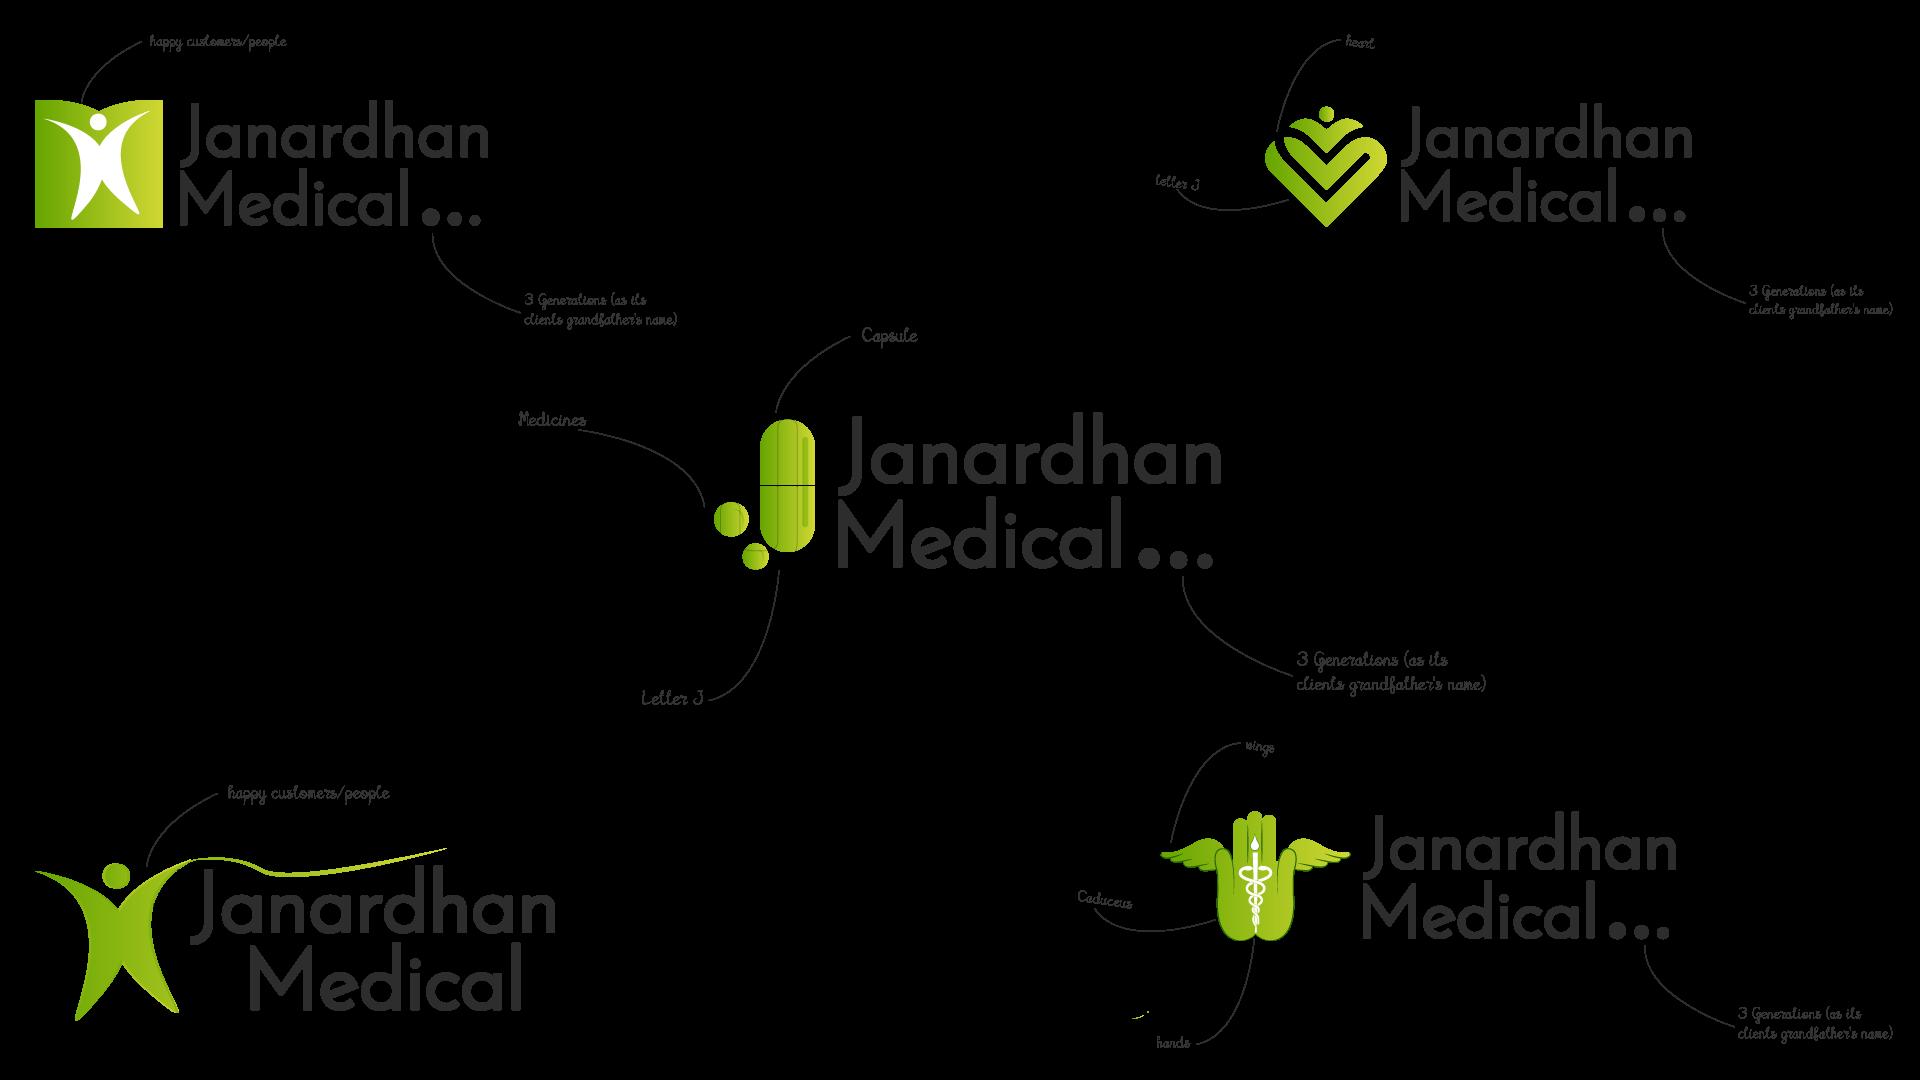 Janardhan-Logo-Exploration